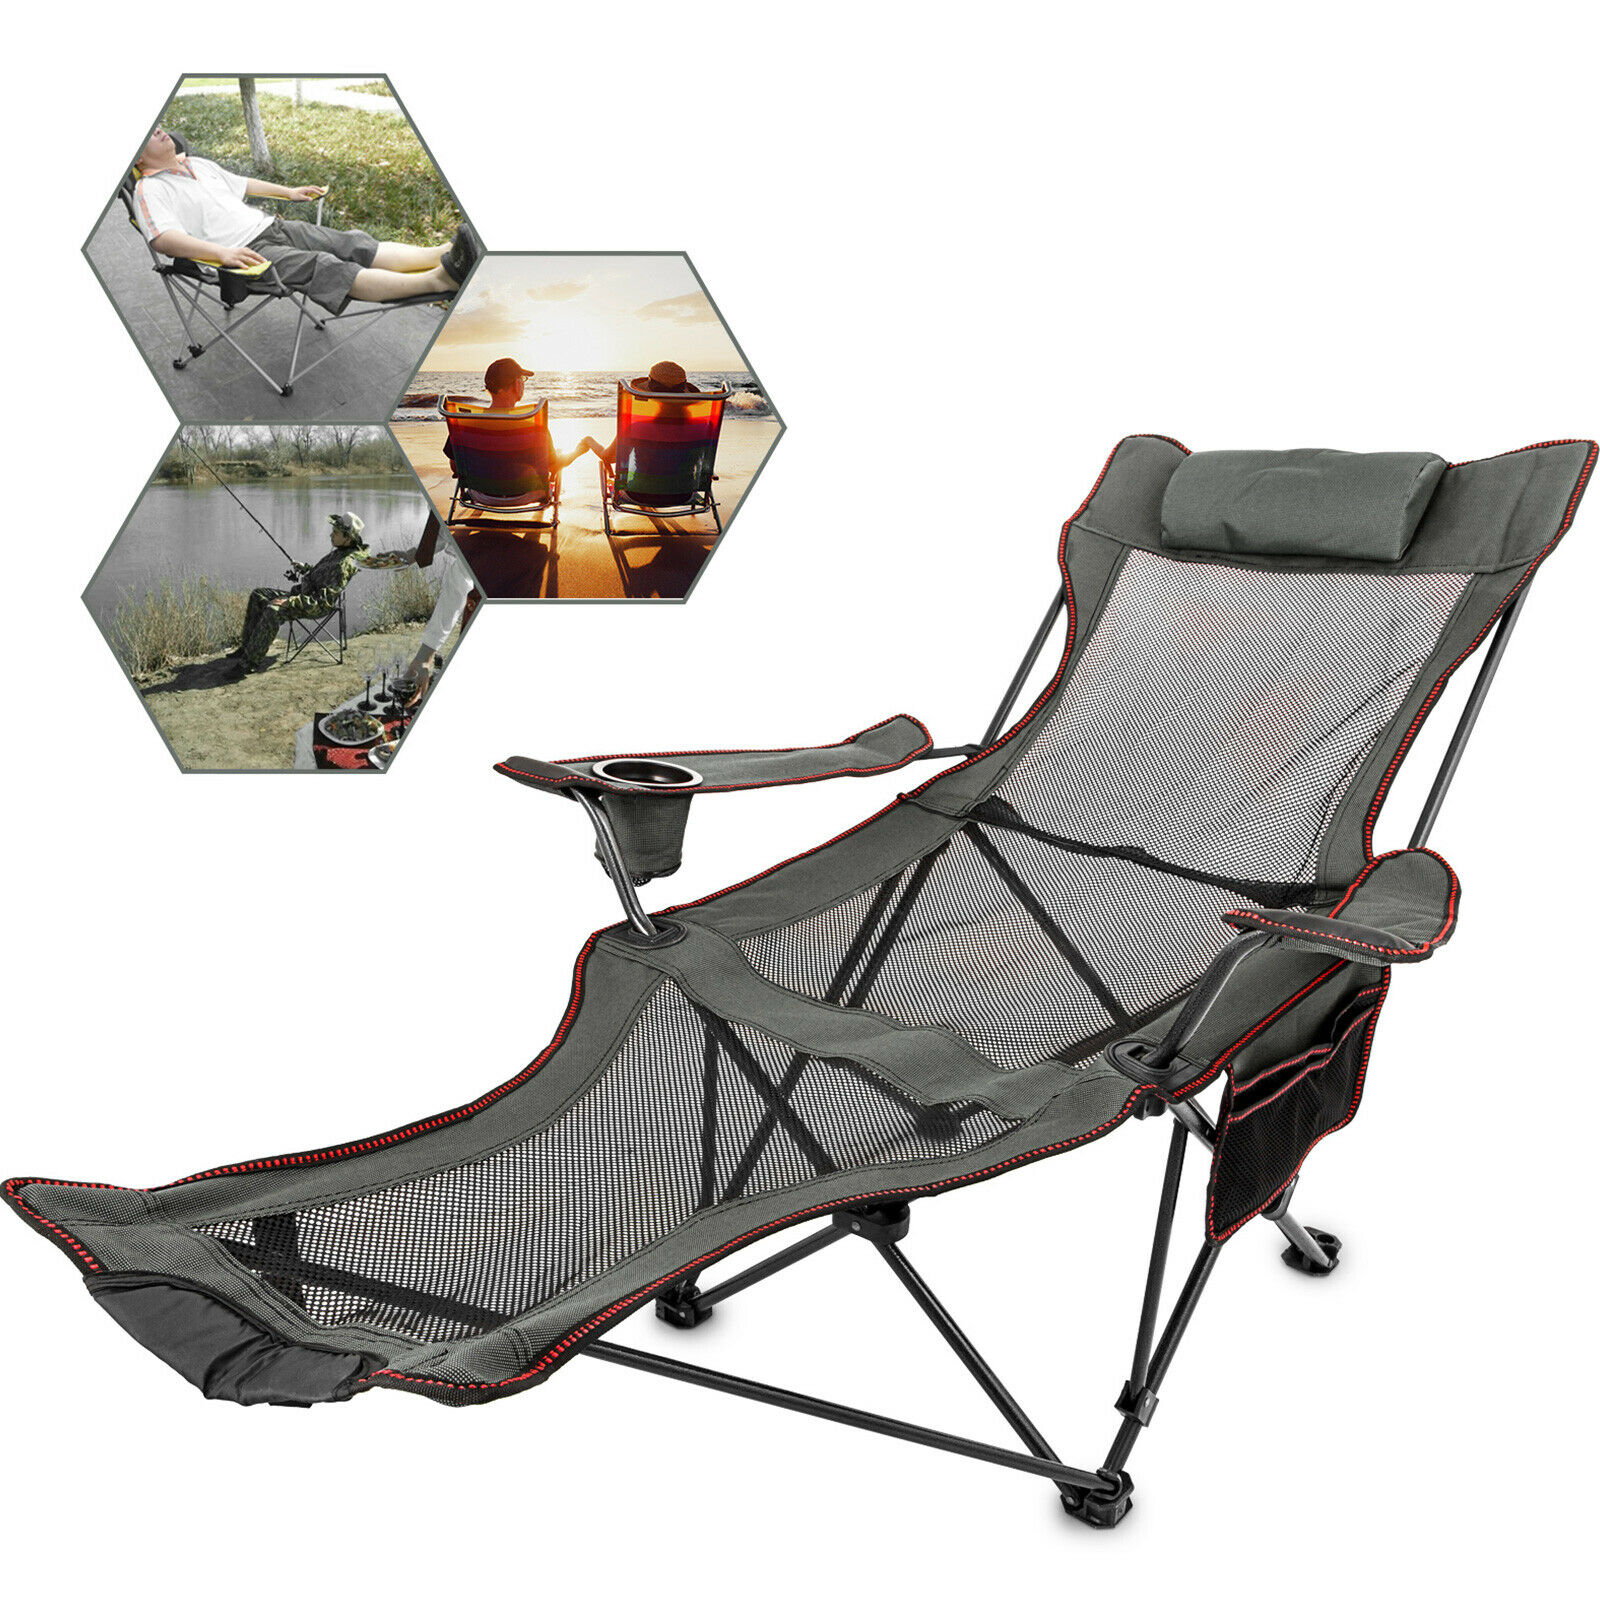 MuddyHunting Reclining Folding Camp Chair 1